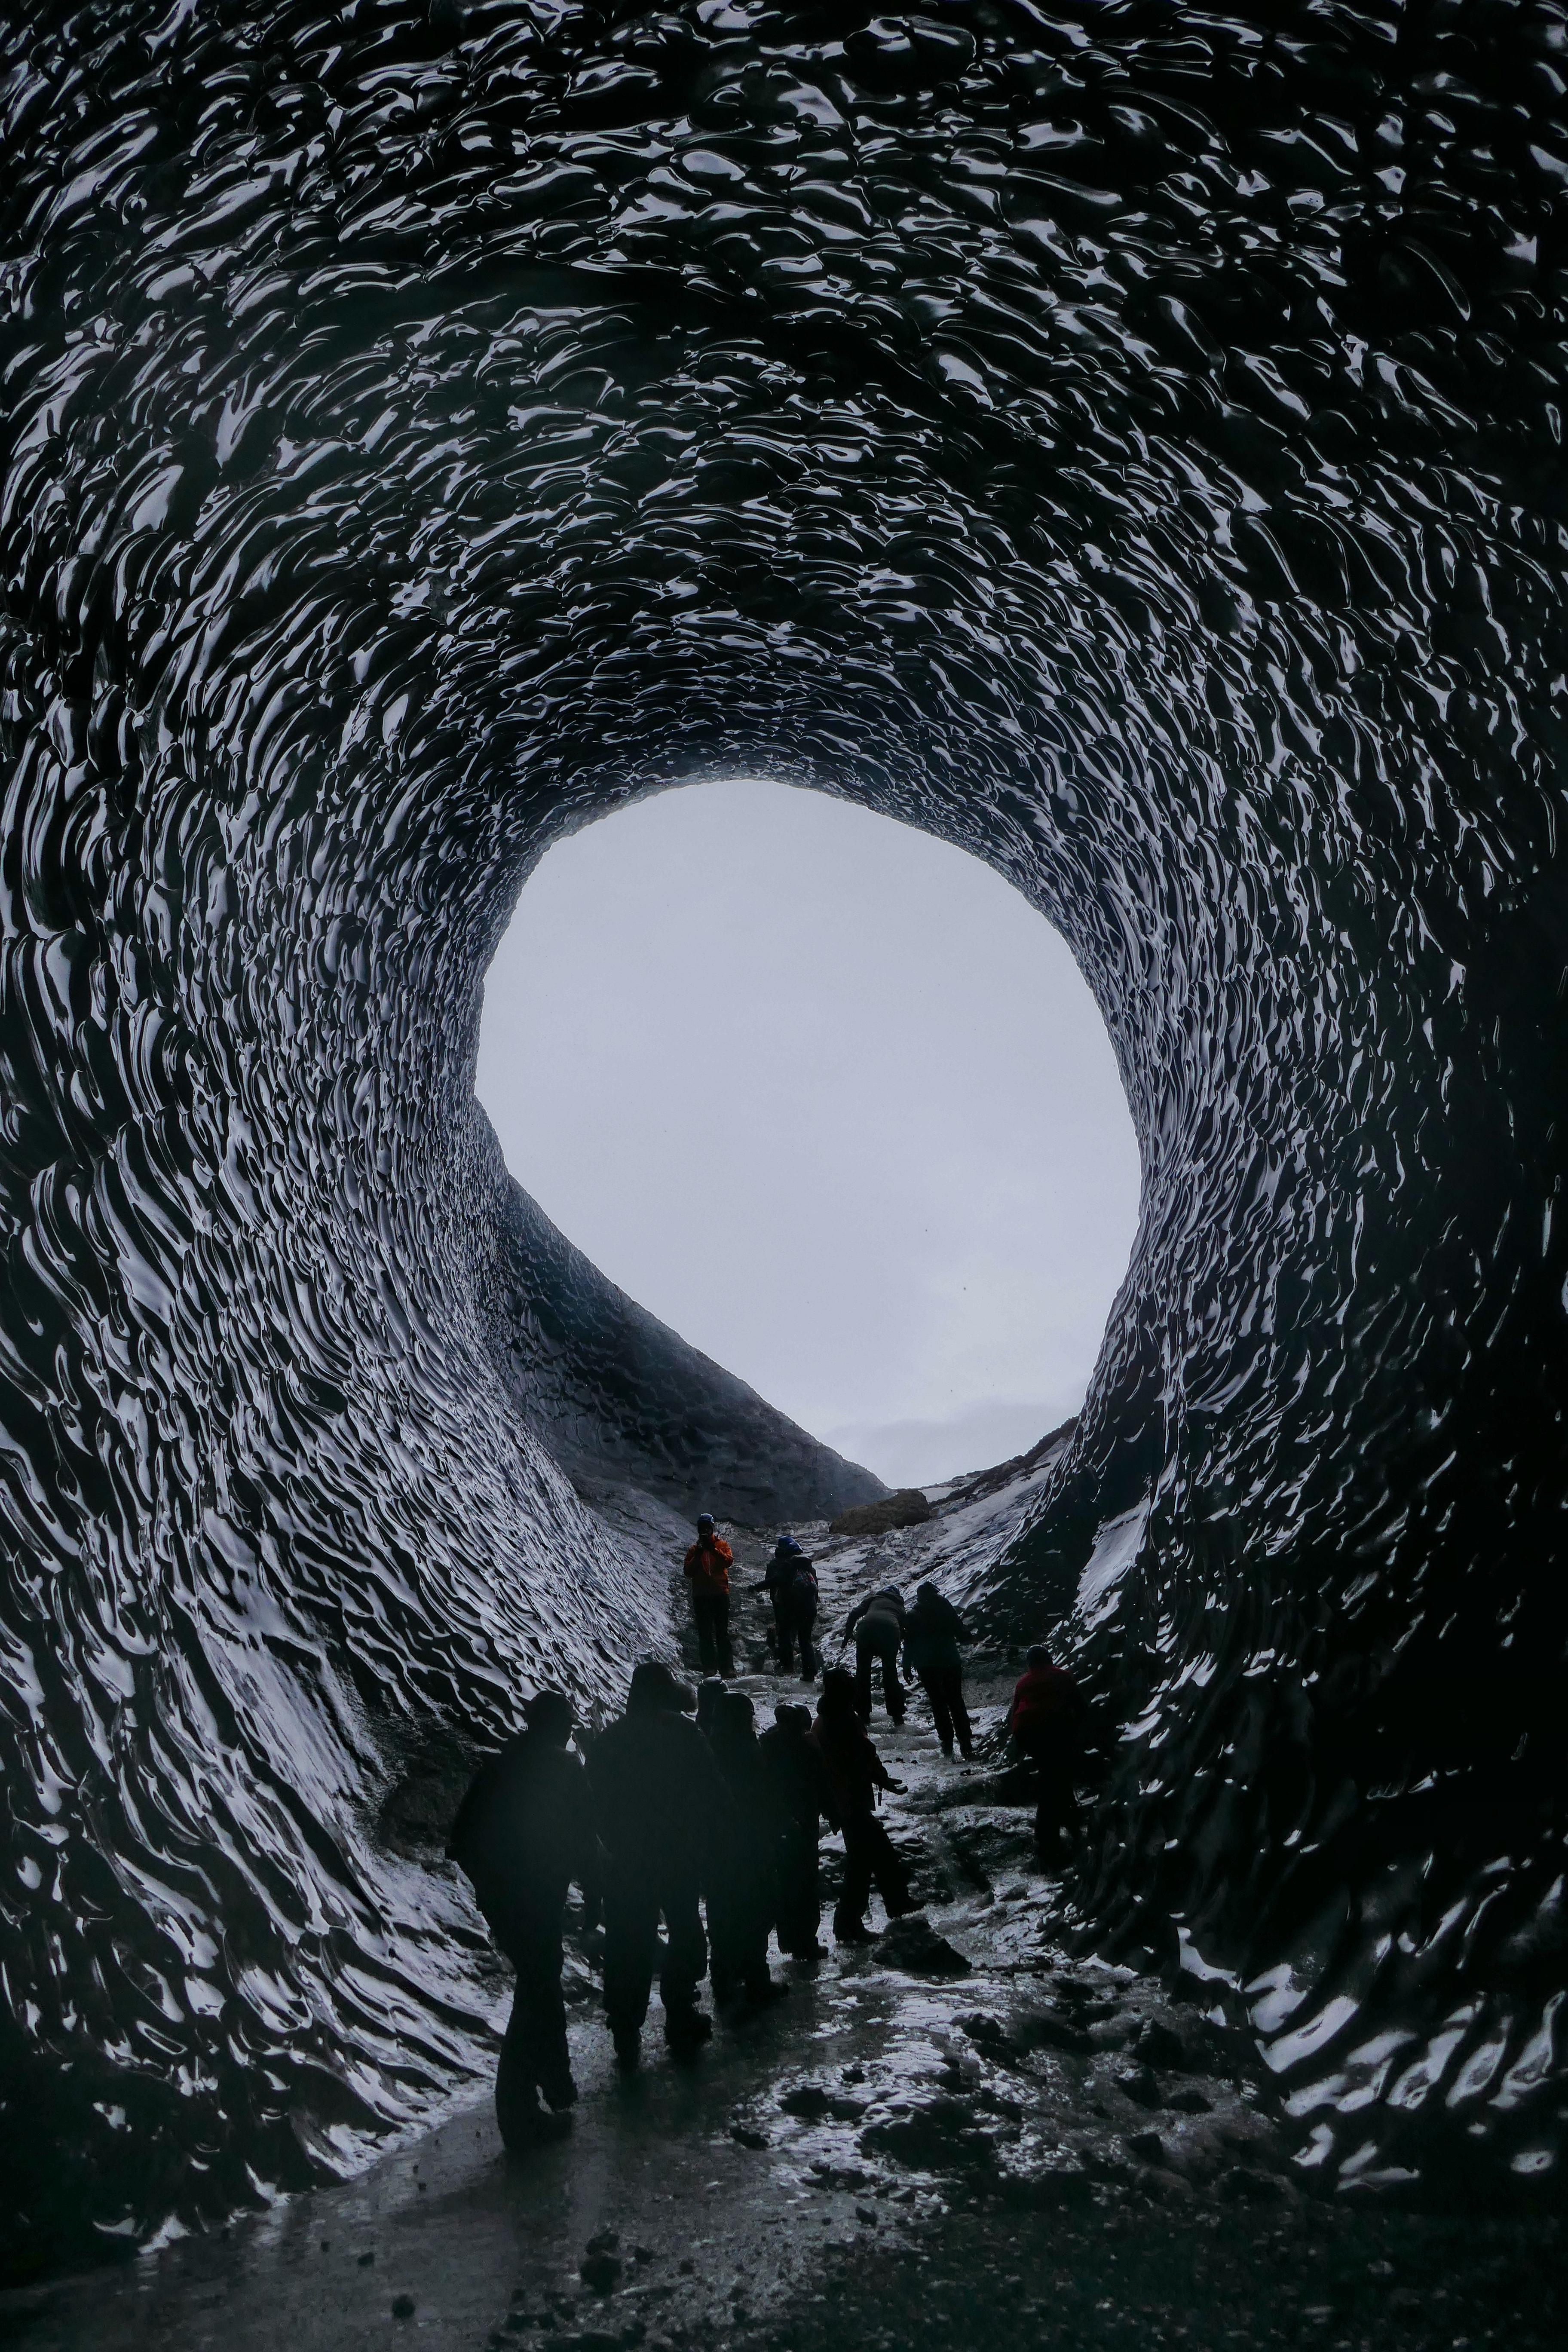 Blue Iceland Glacier tour - Anaconda Ice Cave